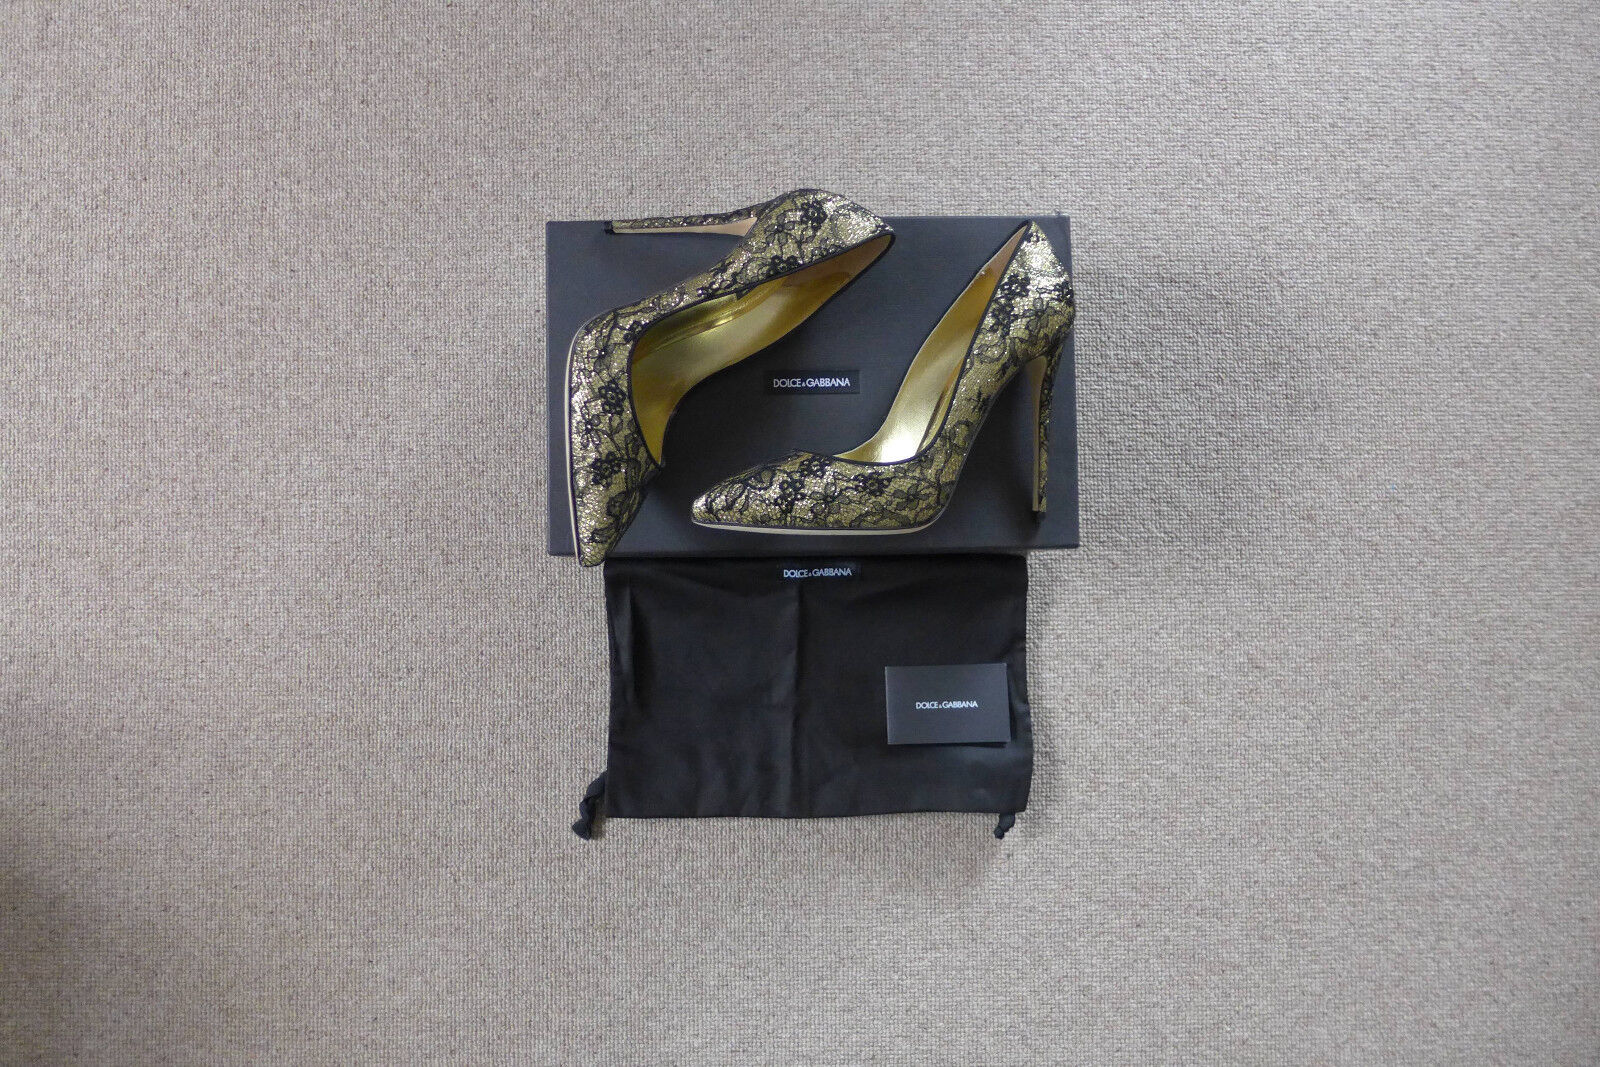 Dolce & Gabbana Glitter Lace Court Schuhes, Schuhes, Schuhes, Größe 40 / UK7 - BNWB, 9713b8